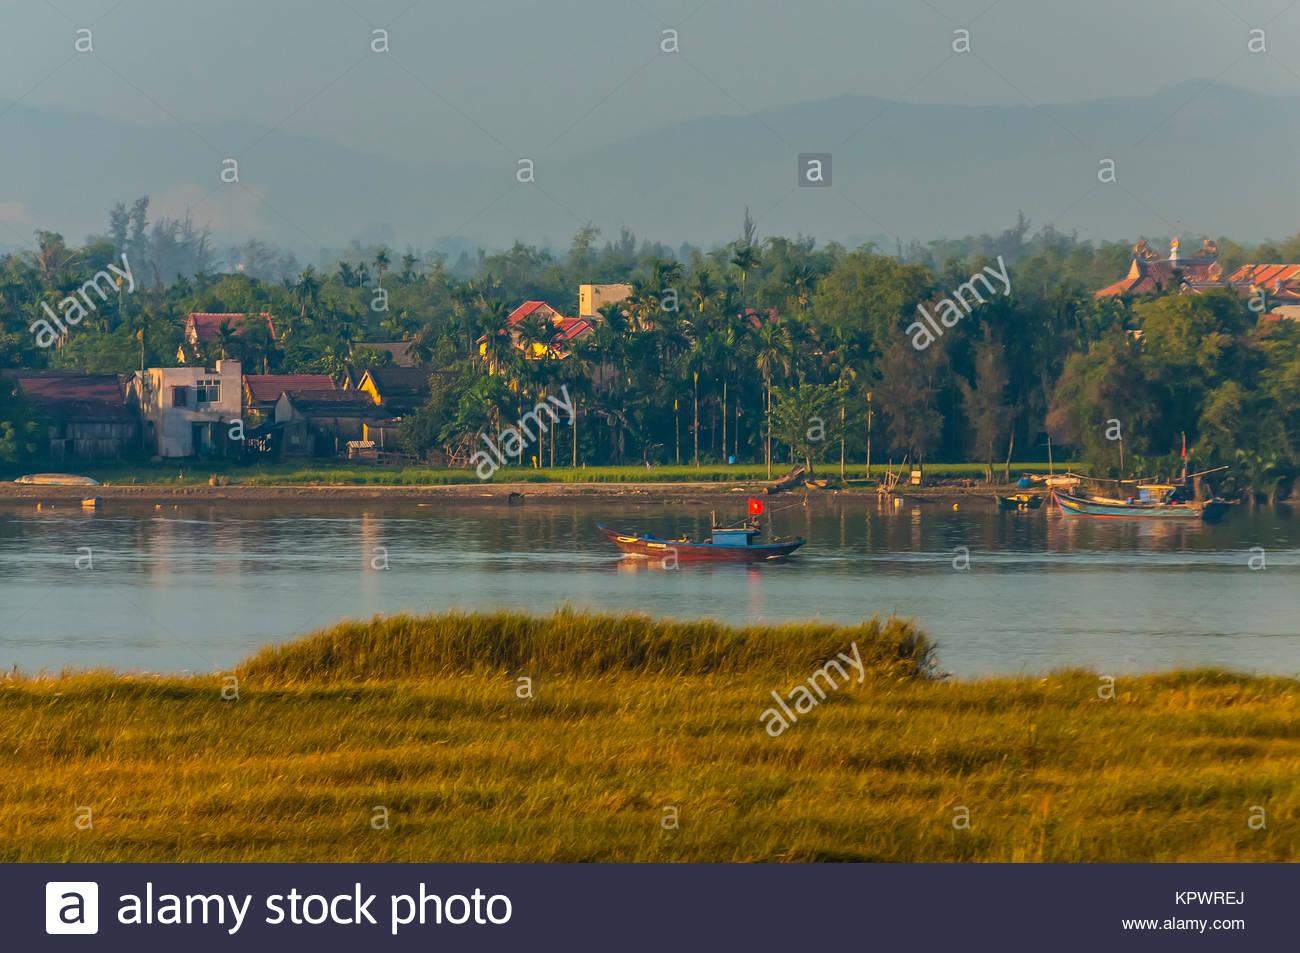 La rivière Thu Bon, Hoi An, Vietnam. Photo Stock